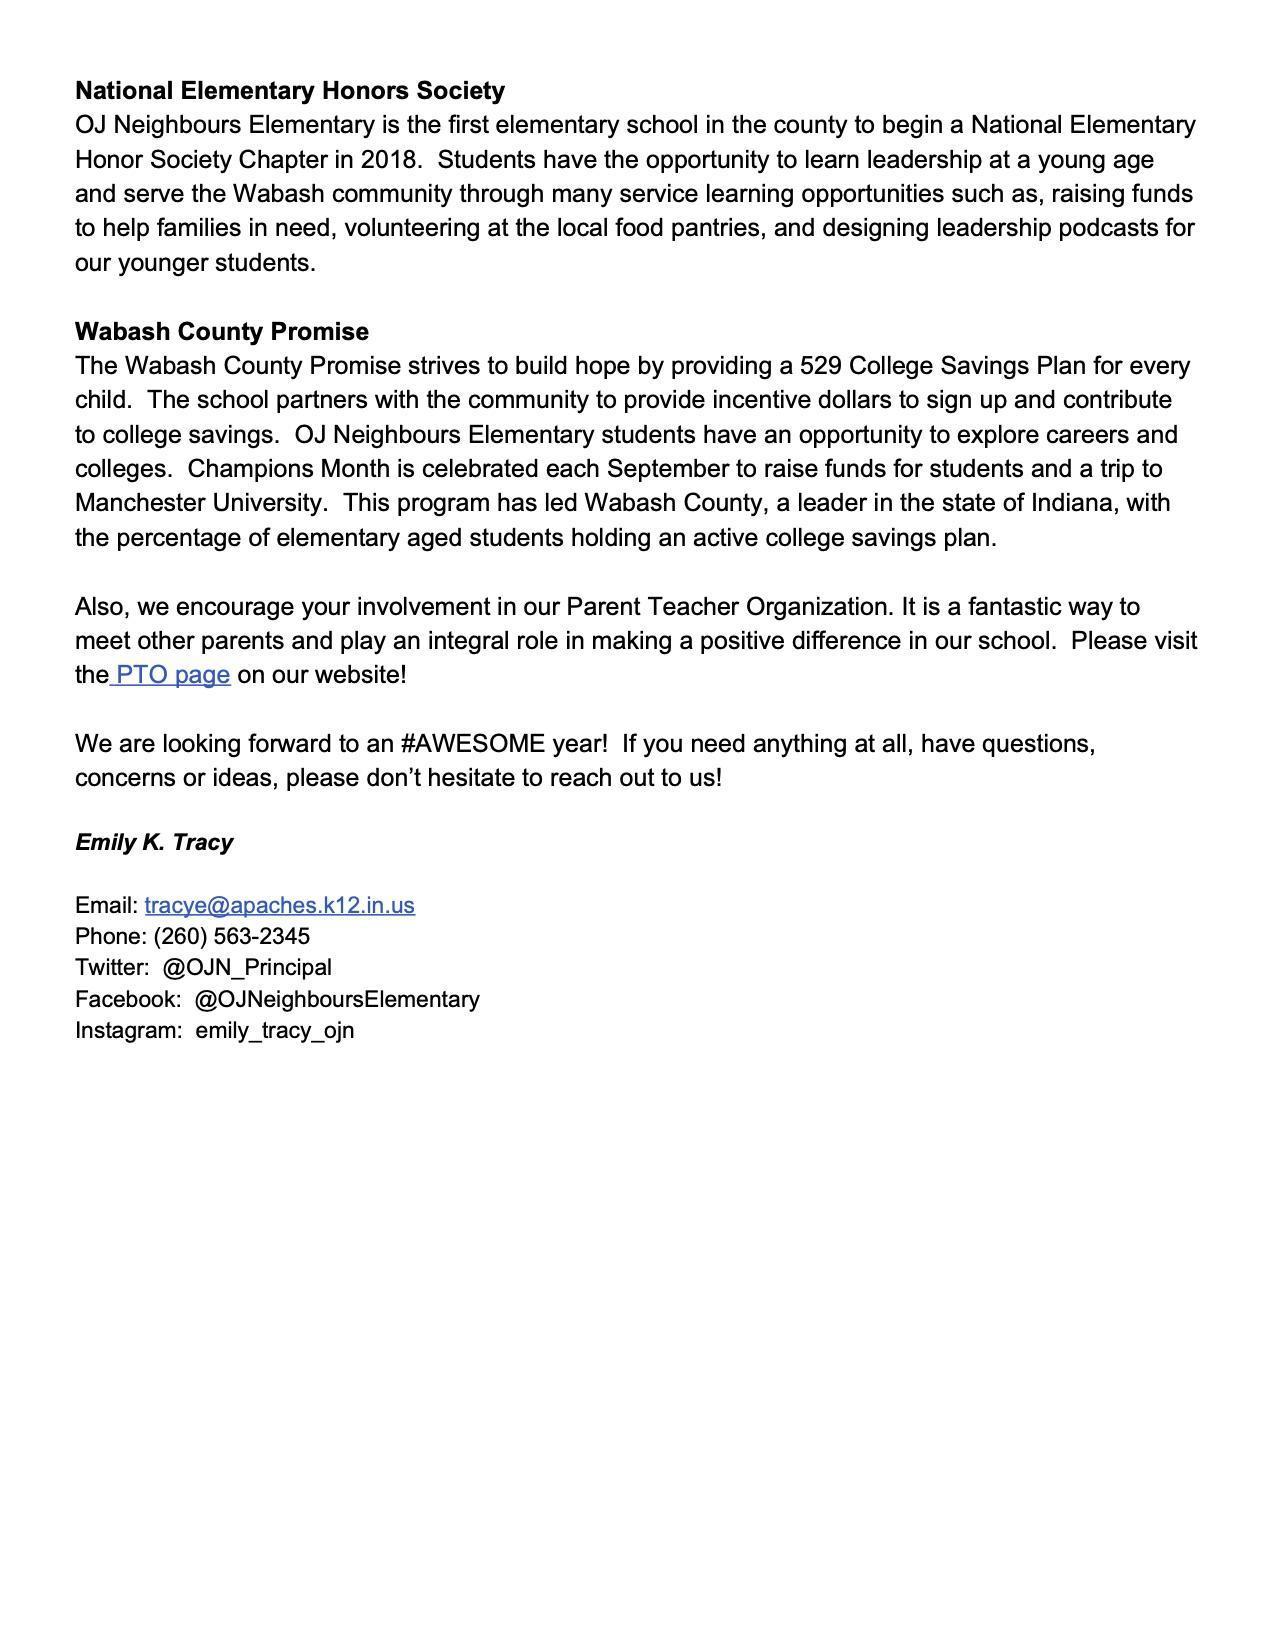 OJN Principal message page 2